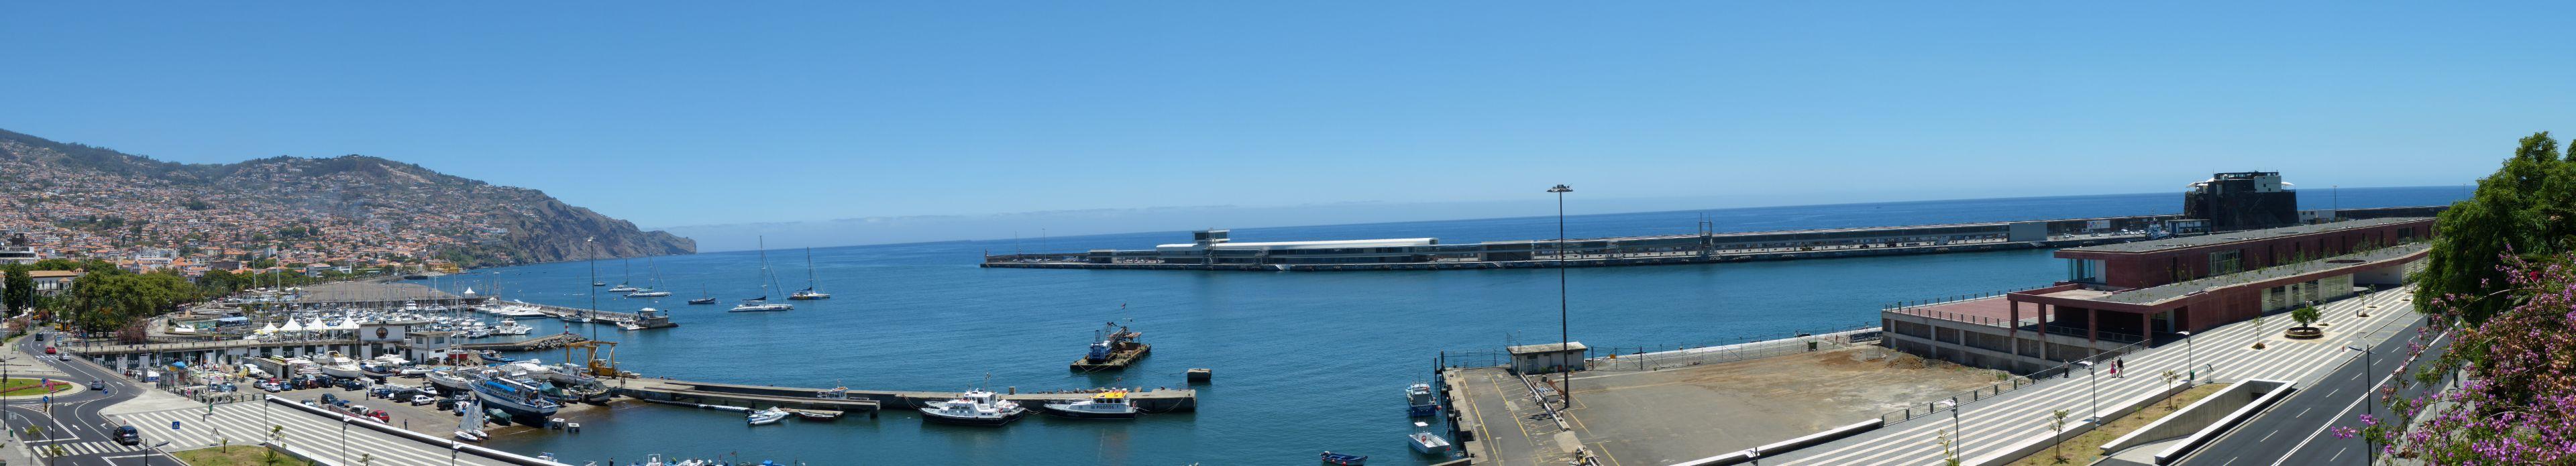 180° Panorama von Funchal